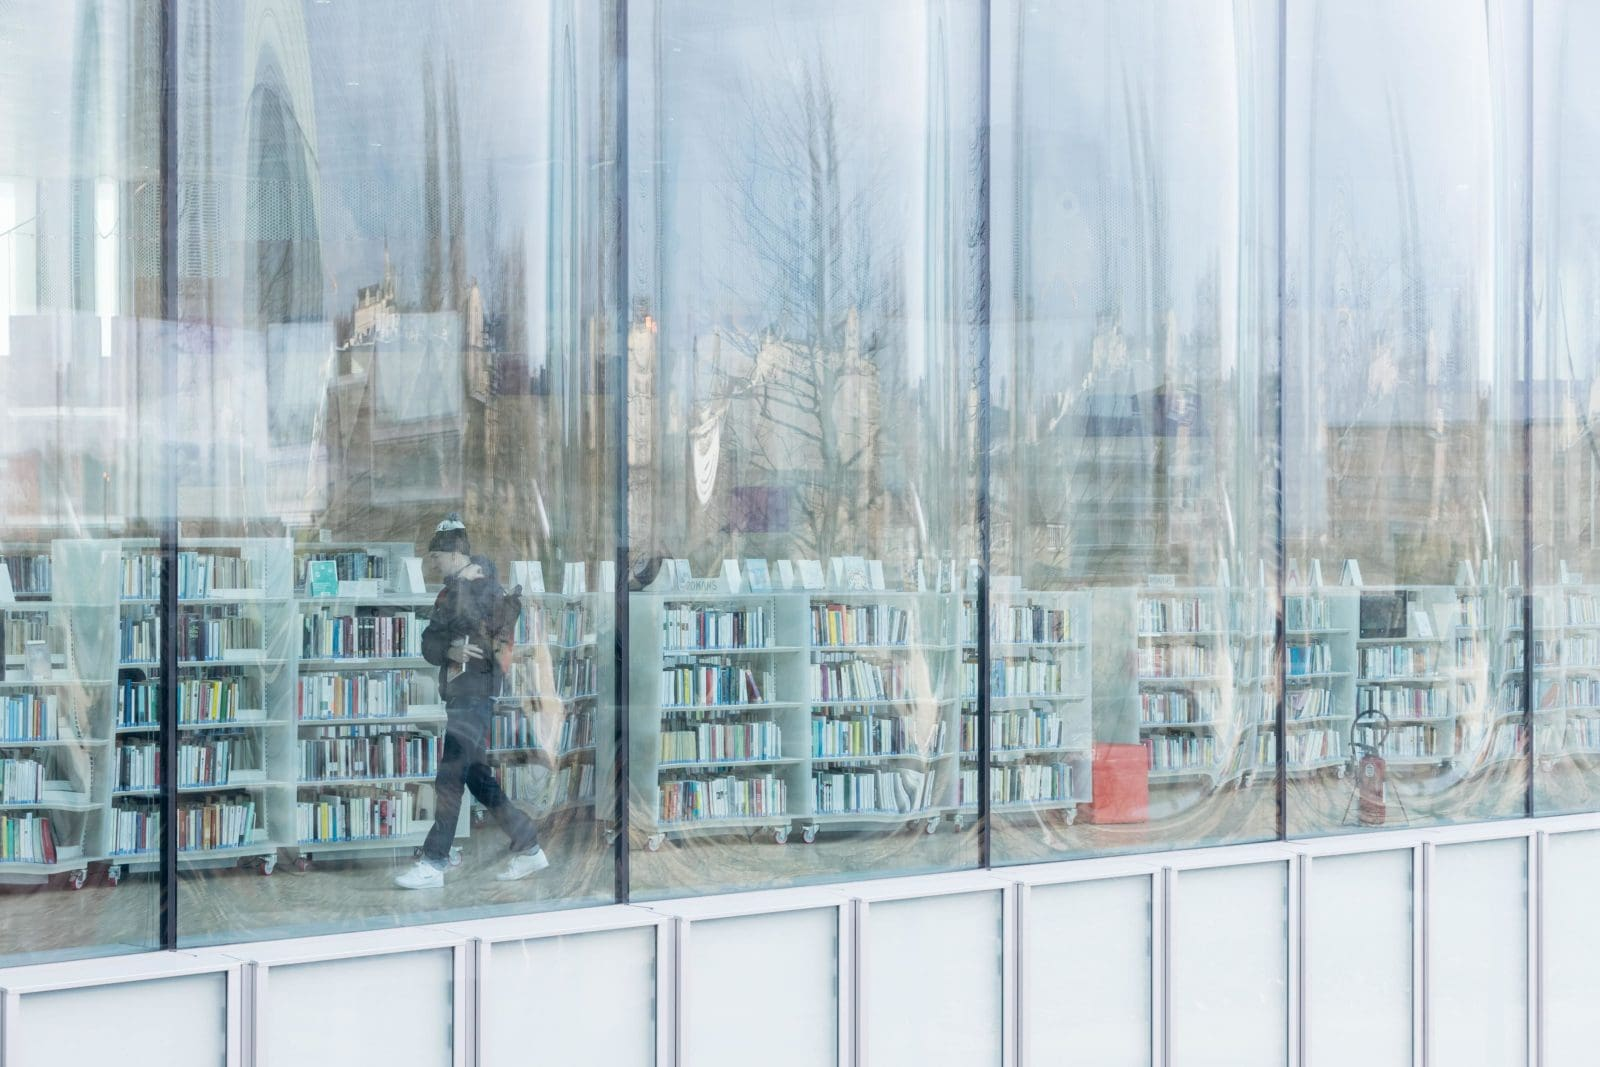 01_Bibliothèque Alexis de Tocqueville_ Photo by Iwan Baan_6421